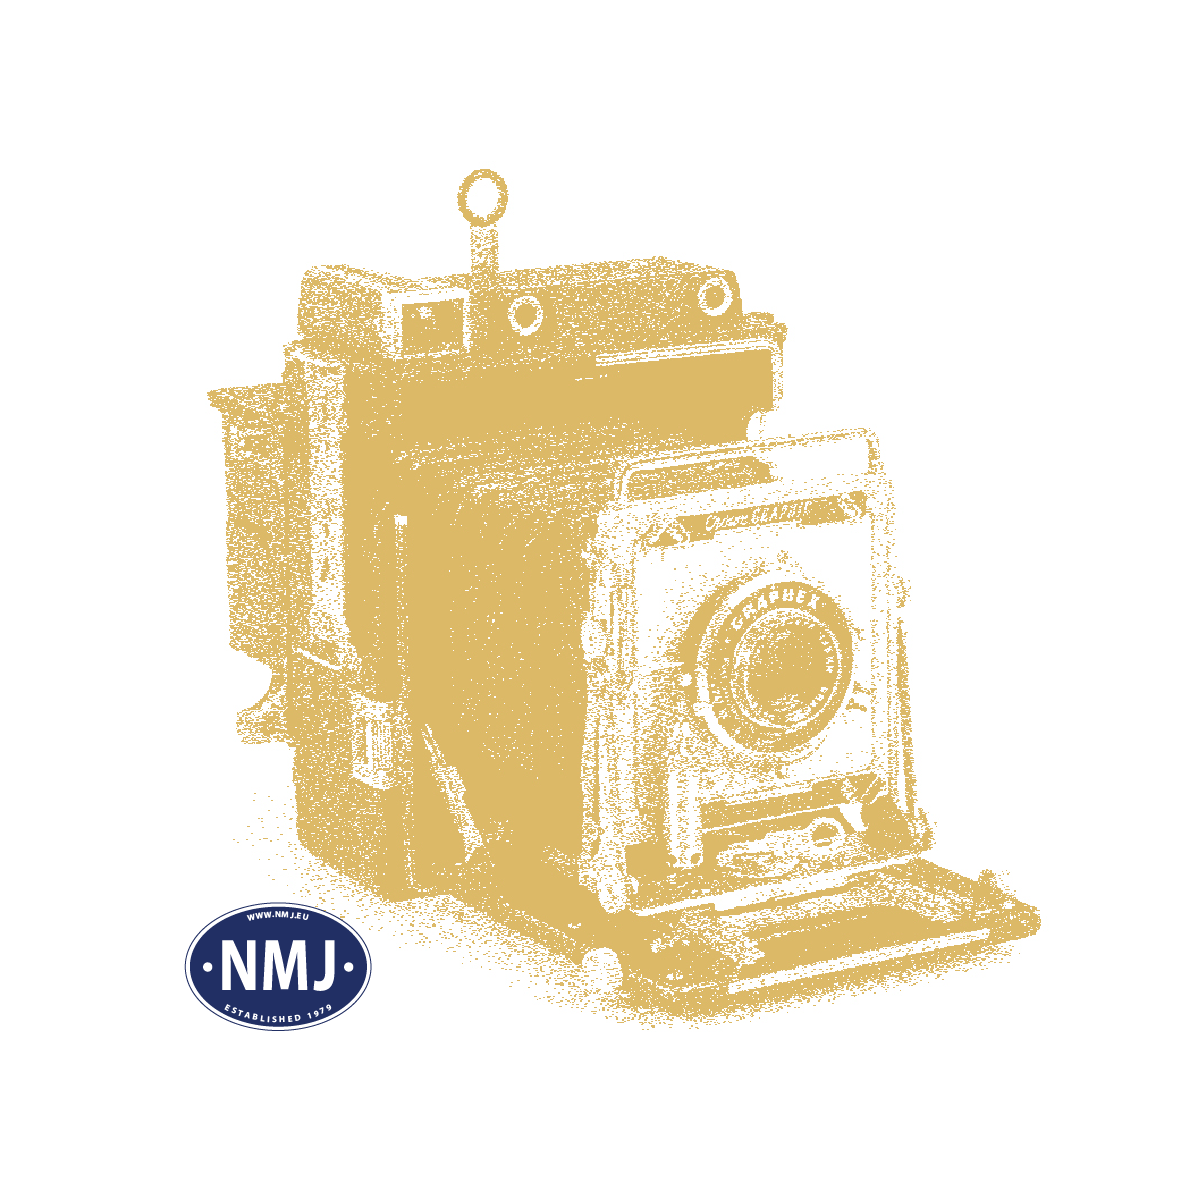 AUH99615 - Katalog Nr. 15 med nyhetene 2018/2019